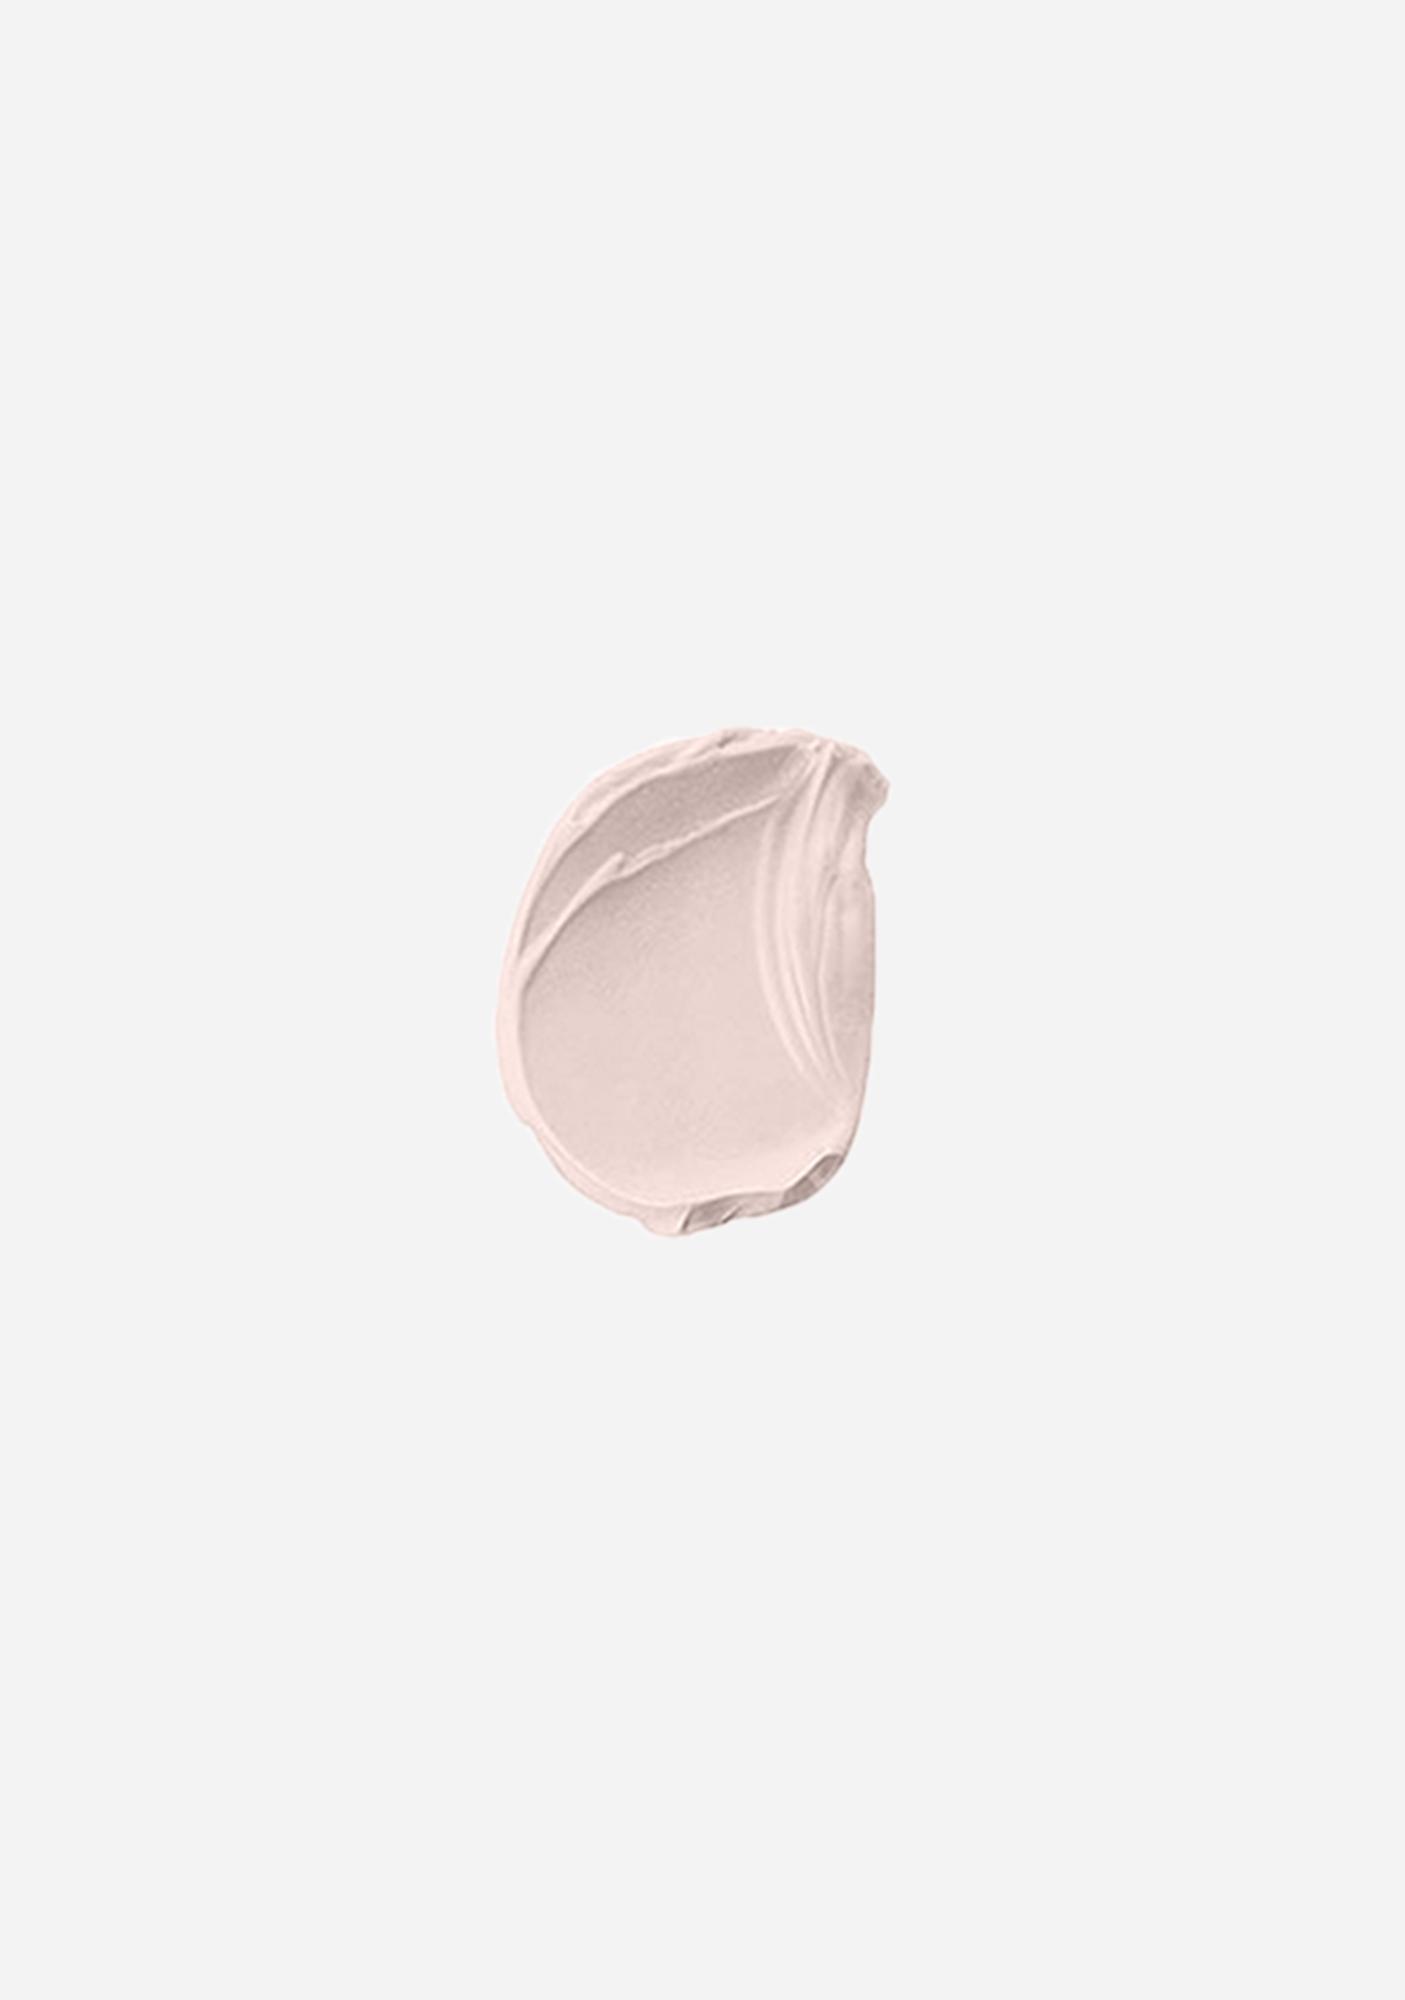 Winky Lux Fair White Tea Tinted Veil